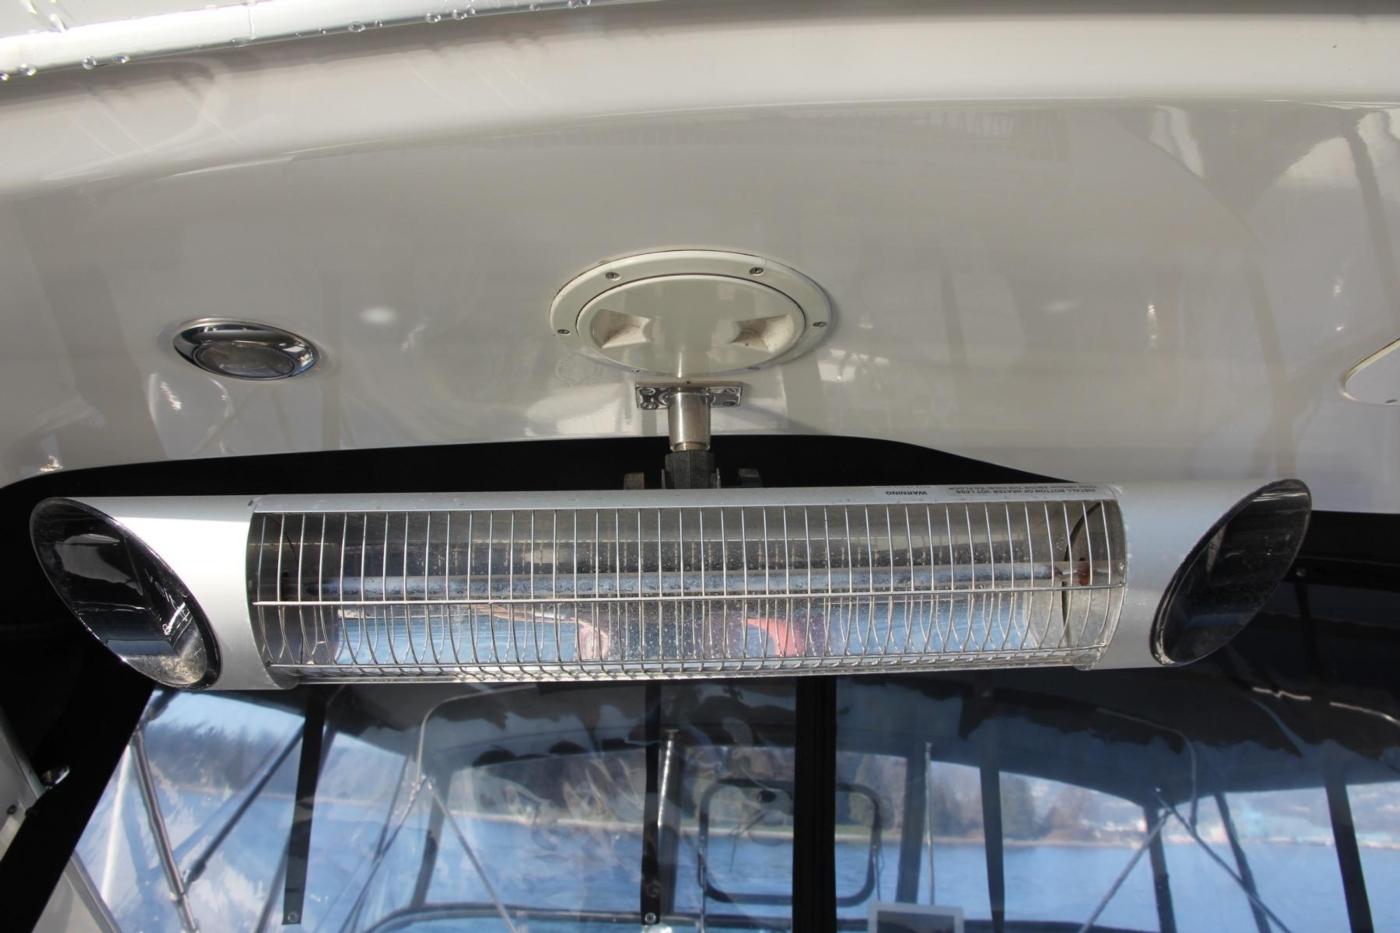 1999 Bayliner 5788 Pilot House Motoryacht, Infra-red Heater